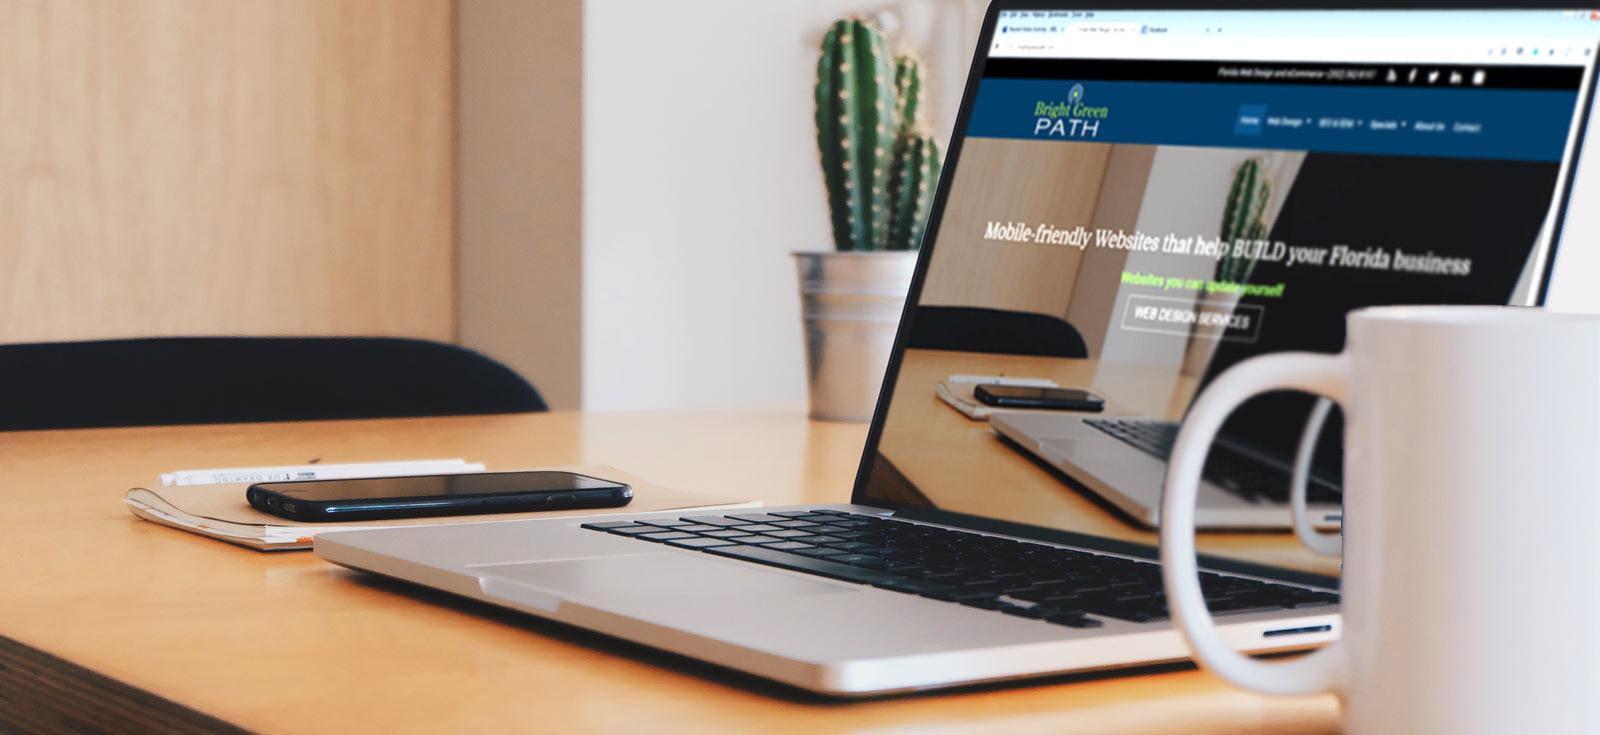 Mobile-friendly Web Design & Development - Internet Marketing - SEO - eCommerce Websites - Ocala, Florida